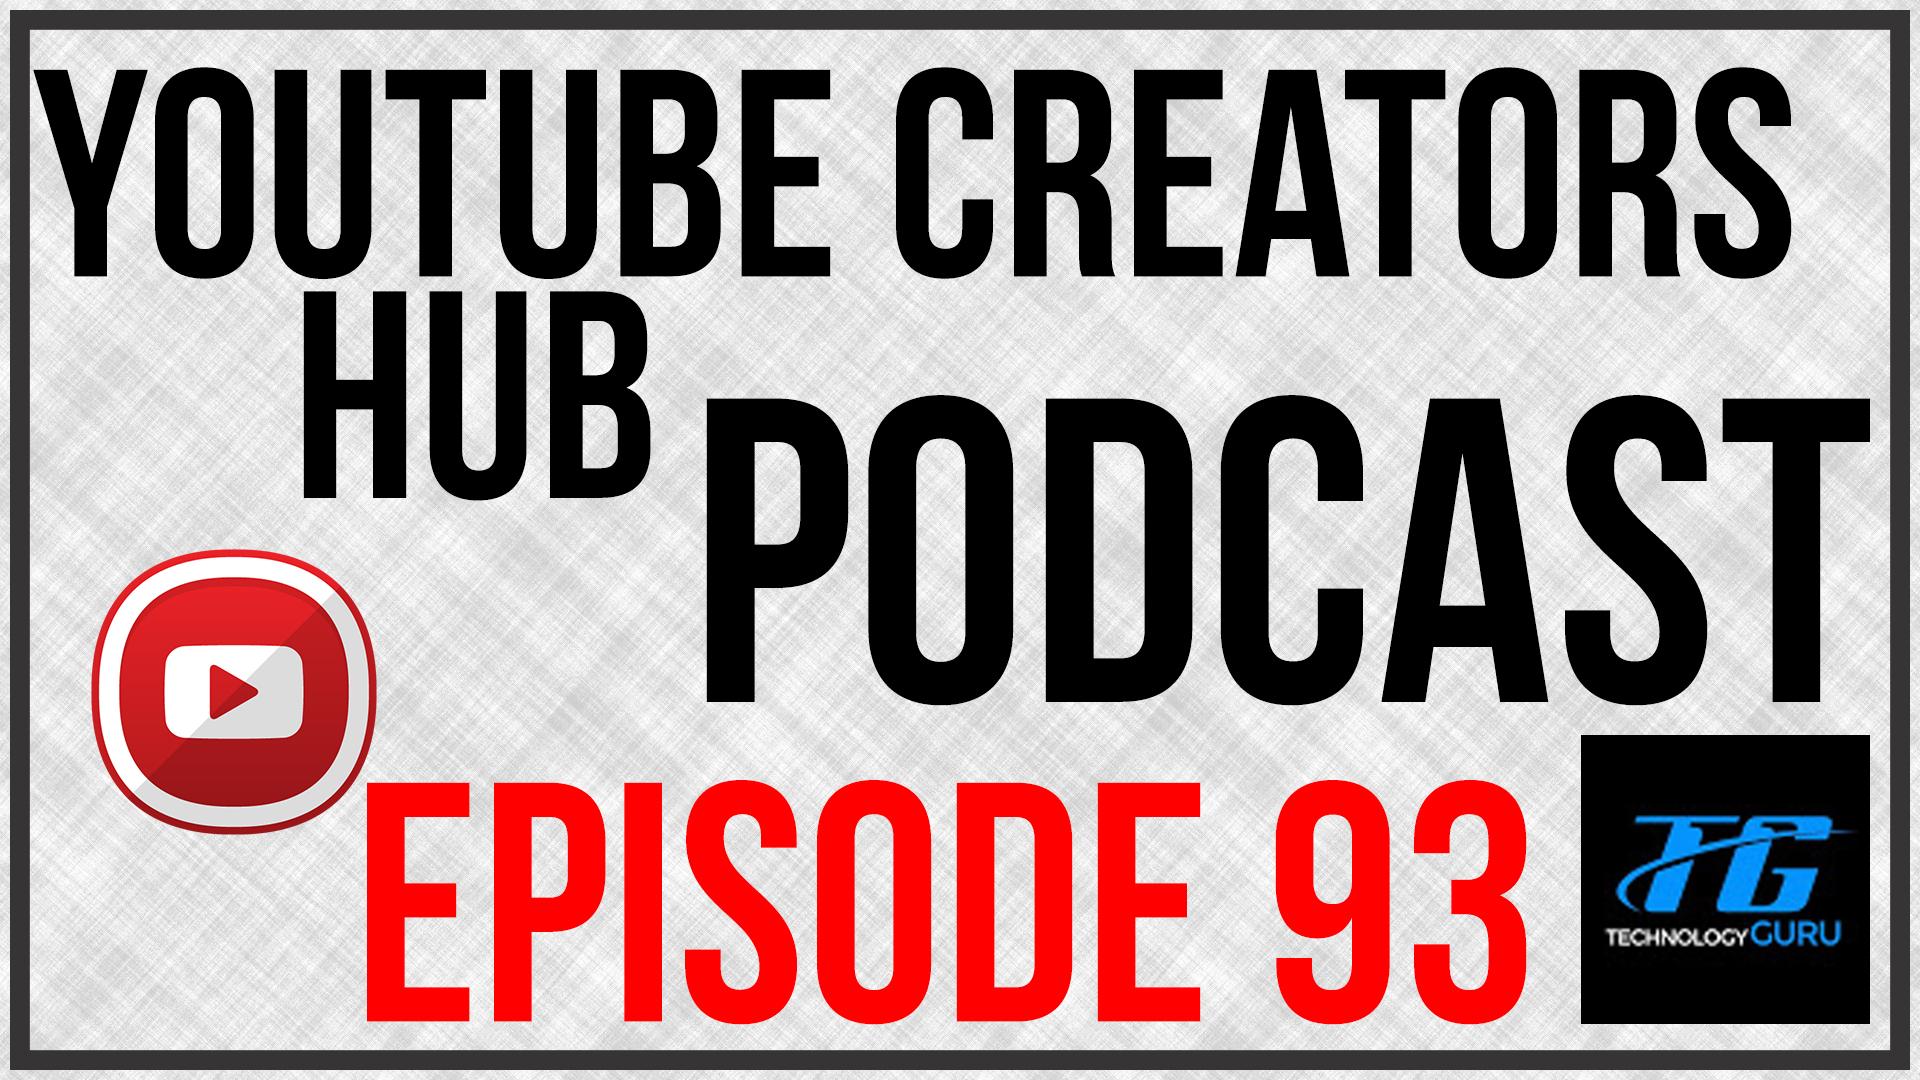 YTCH Podcast Episode 93